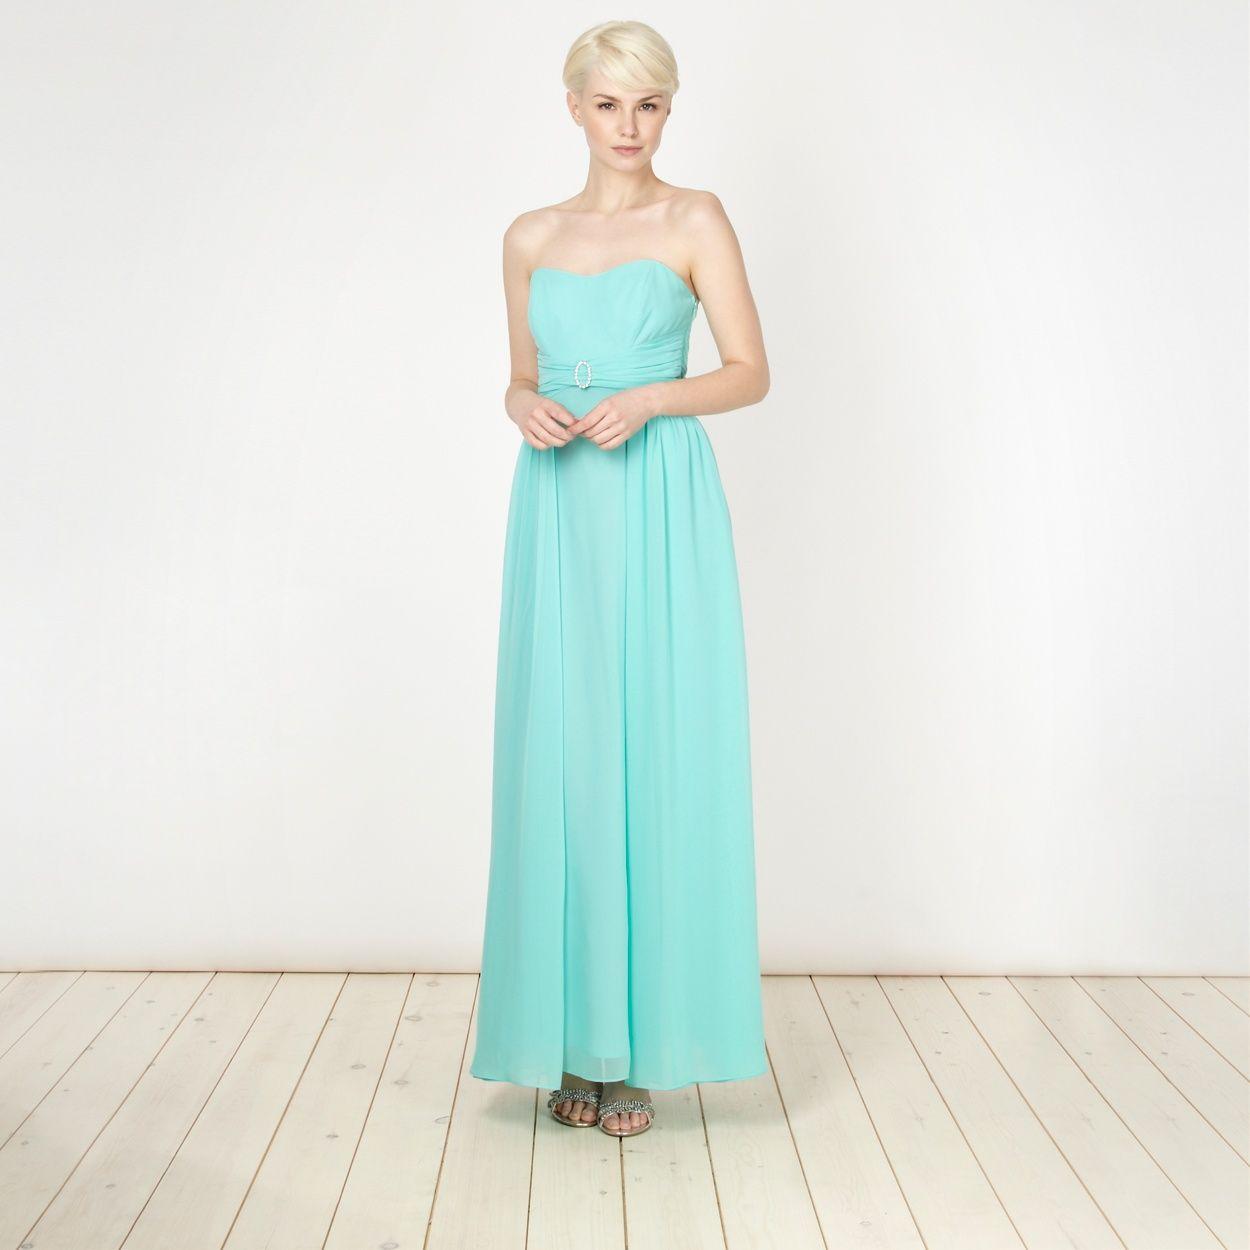 Debut Turquoise diamante buckled maxi dress- at Debenhams.com This ...